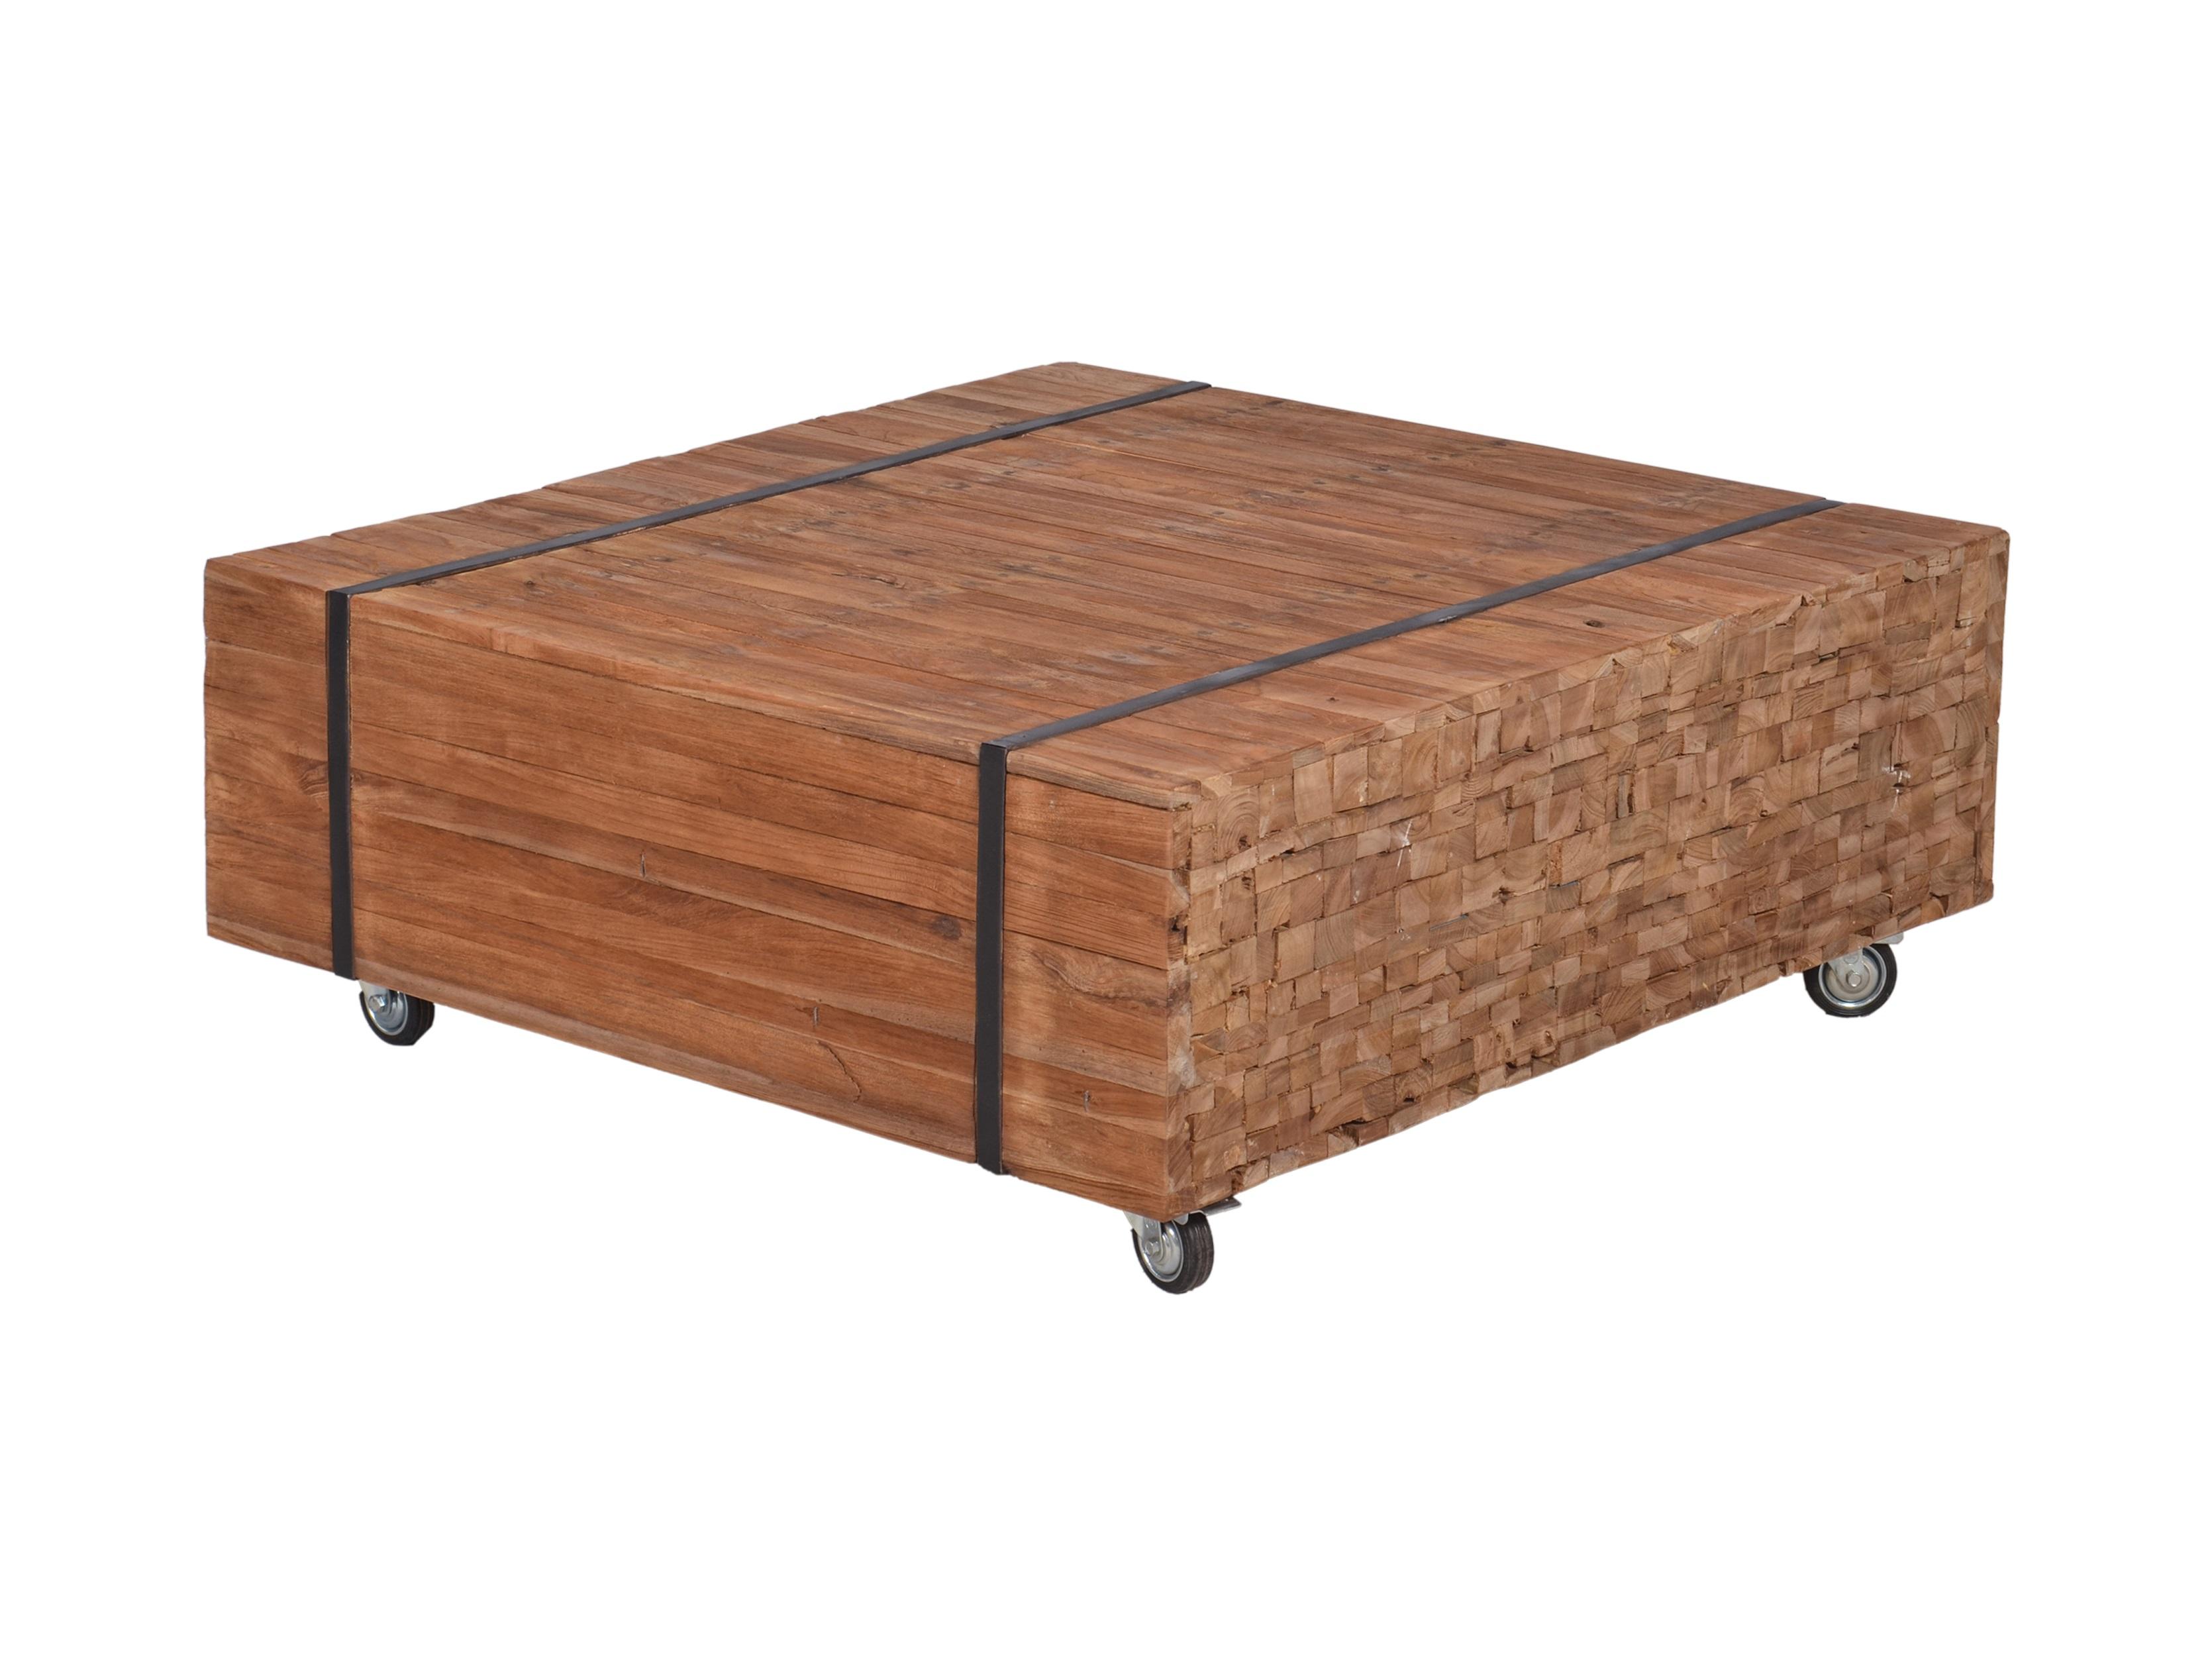 Salontafels Hout Vierkant.Markus John Wood Robuuste Salontafel Blokhout Vierkant 100 Cm